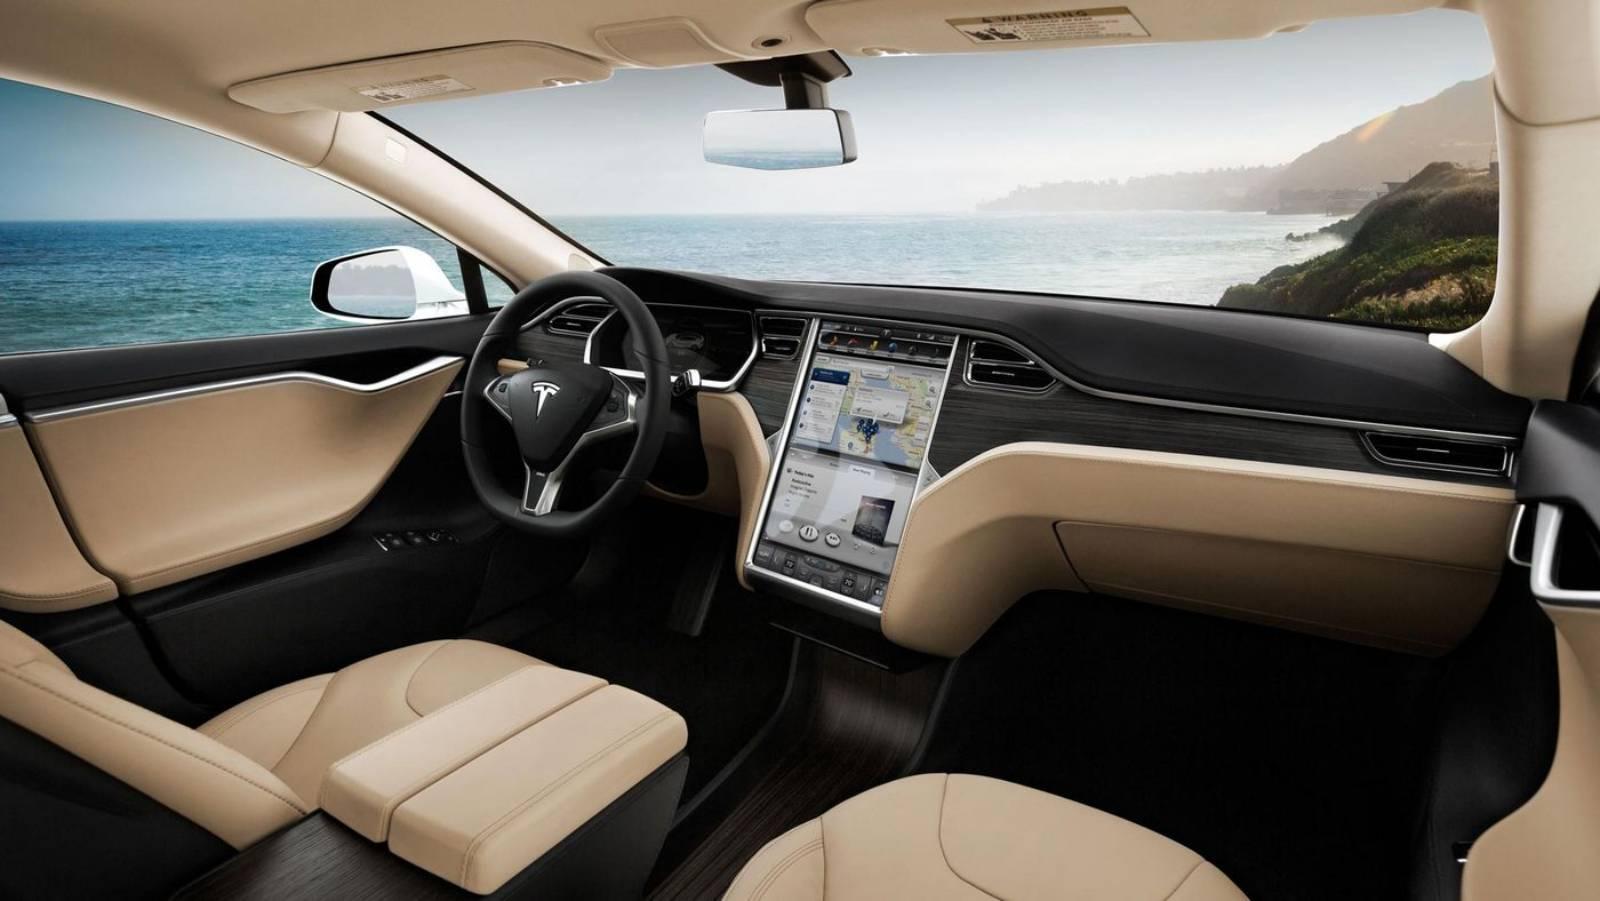 Masinile Tesla Noutatea la care VISEZI pe BMW, Audi, Mercedes, Volkswagen